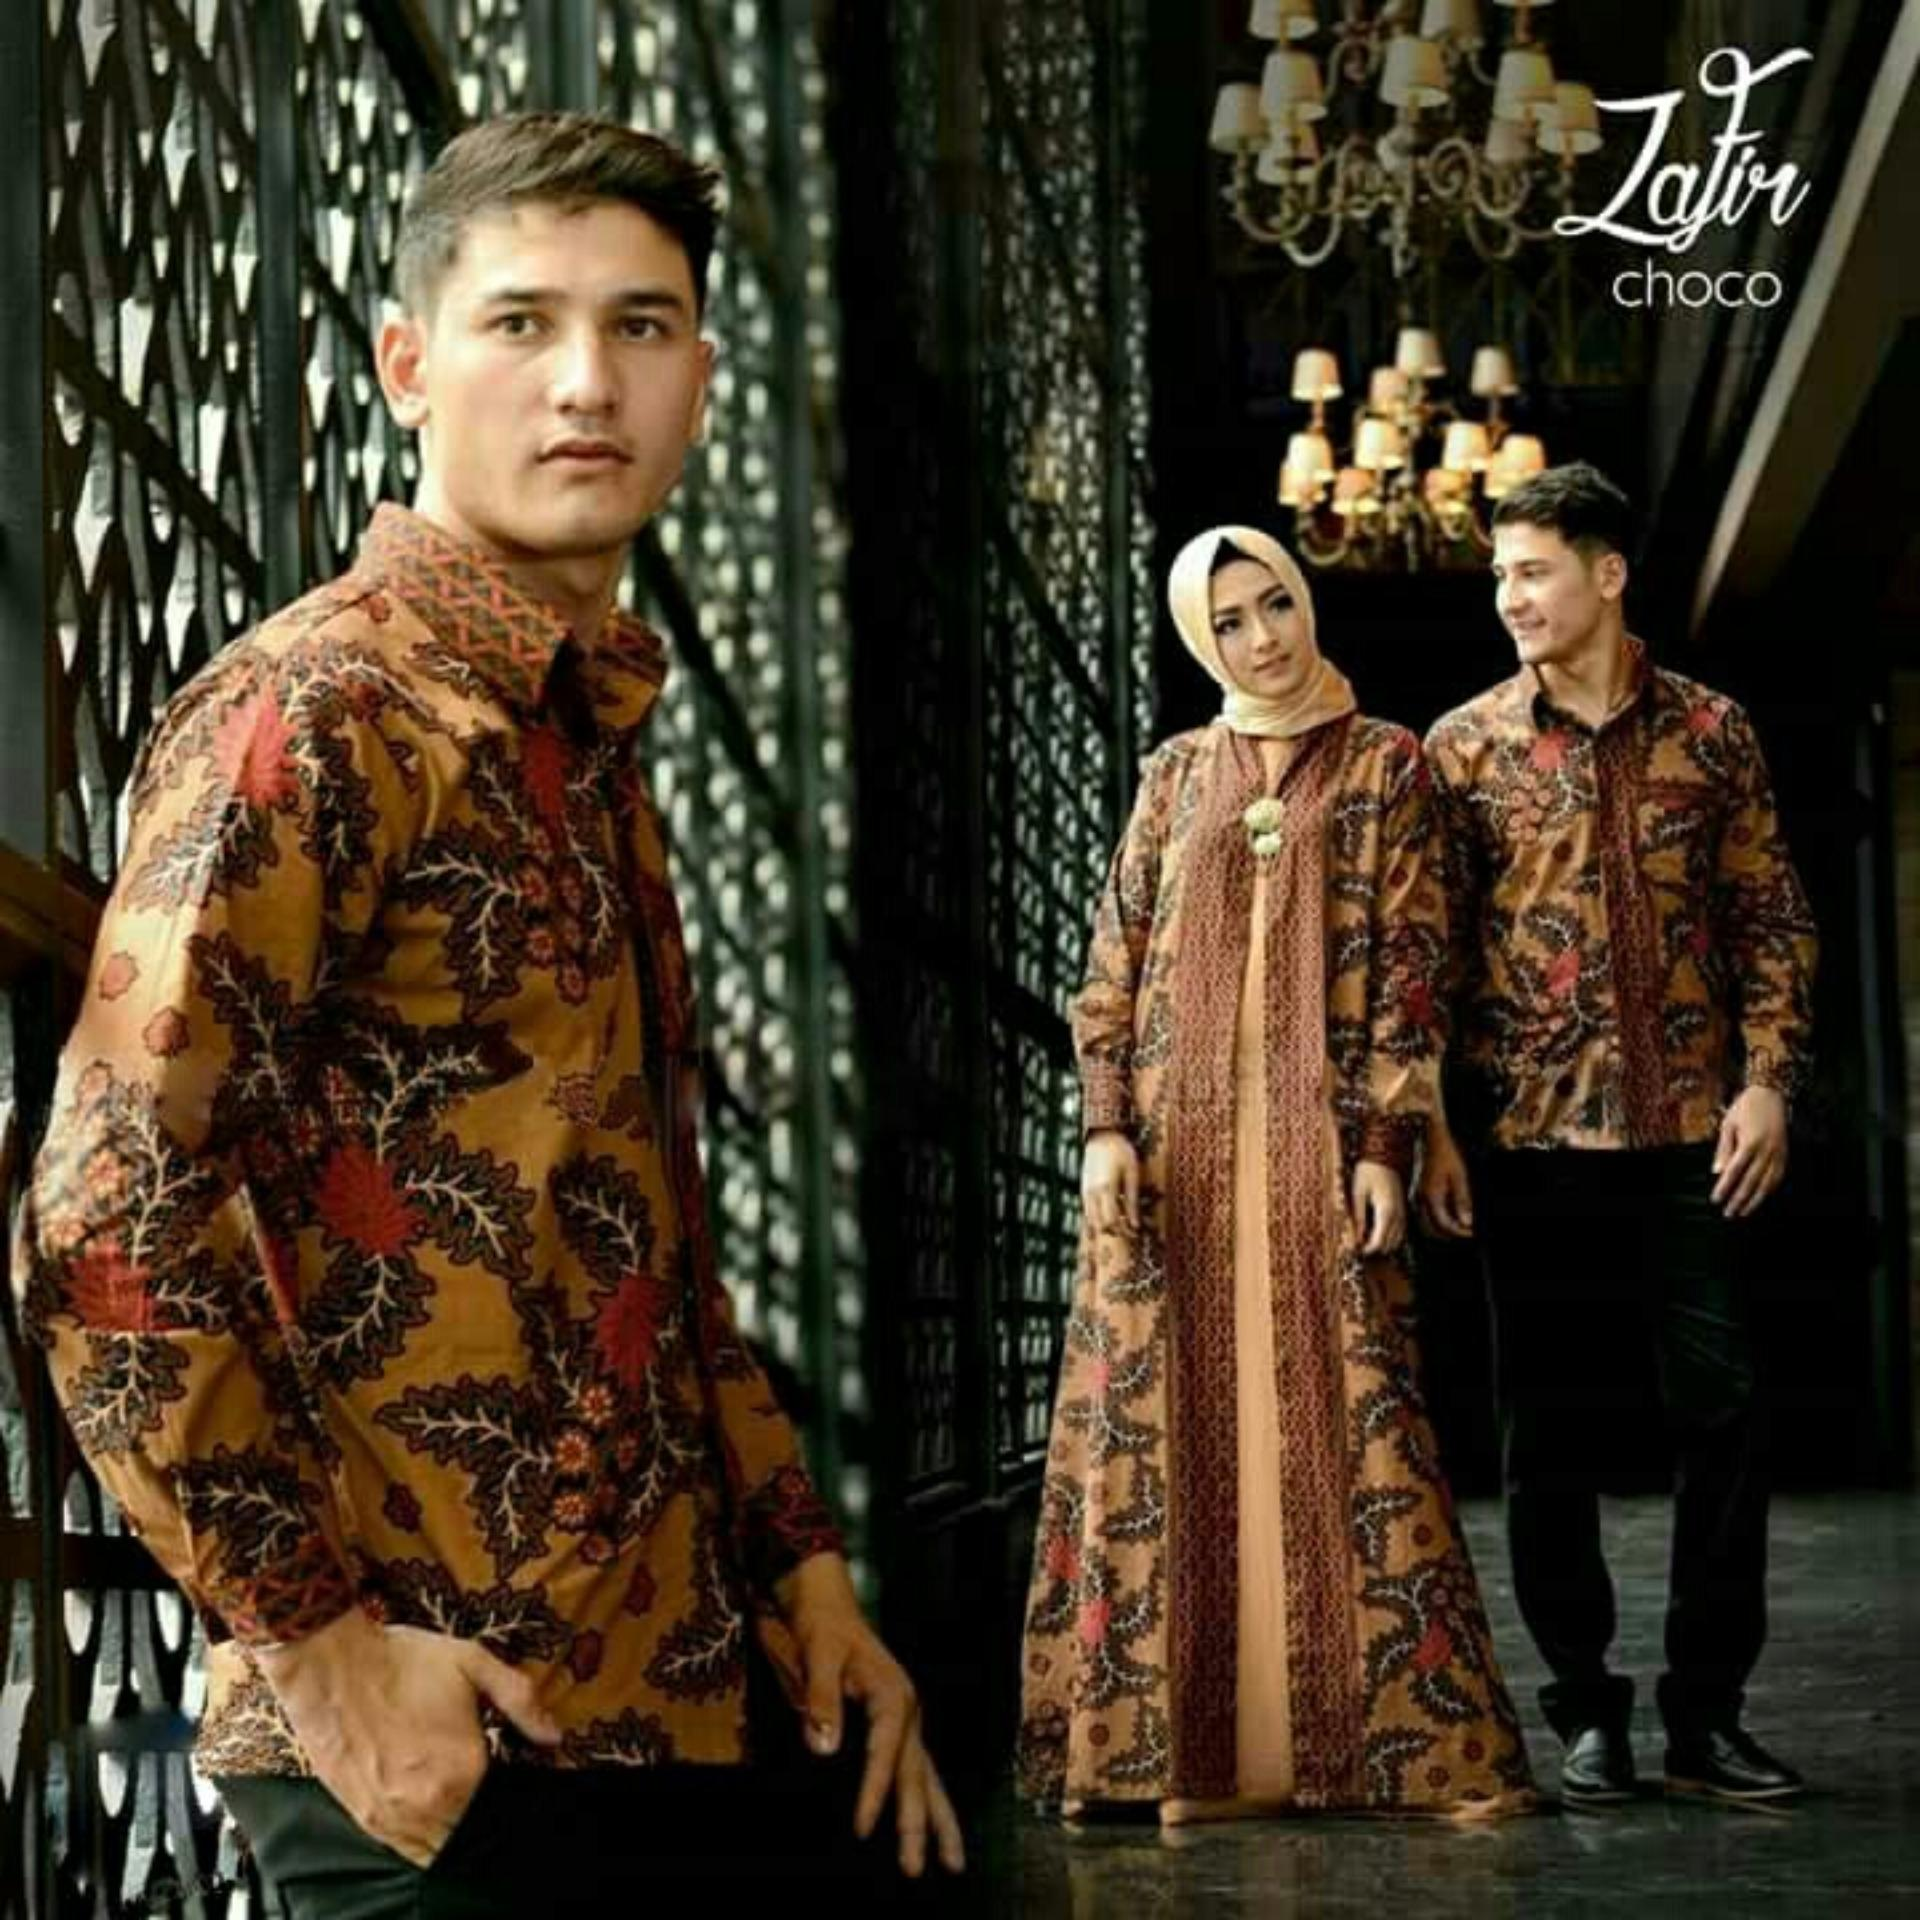 Perbandingan Harga Hasanah Couple Gamis Zafir Coklat Couple Suami